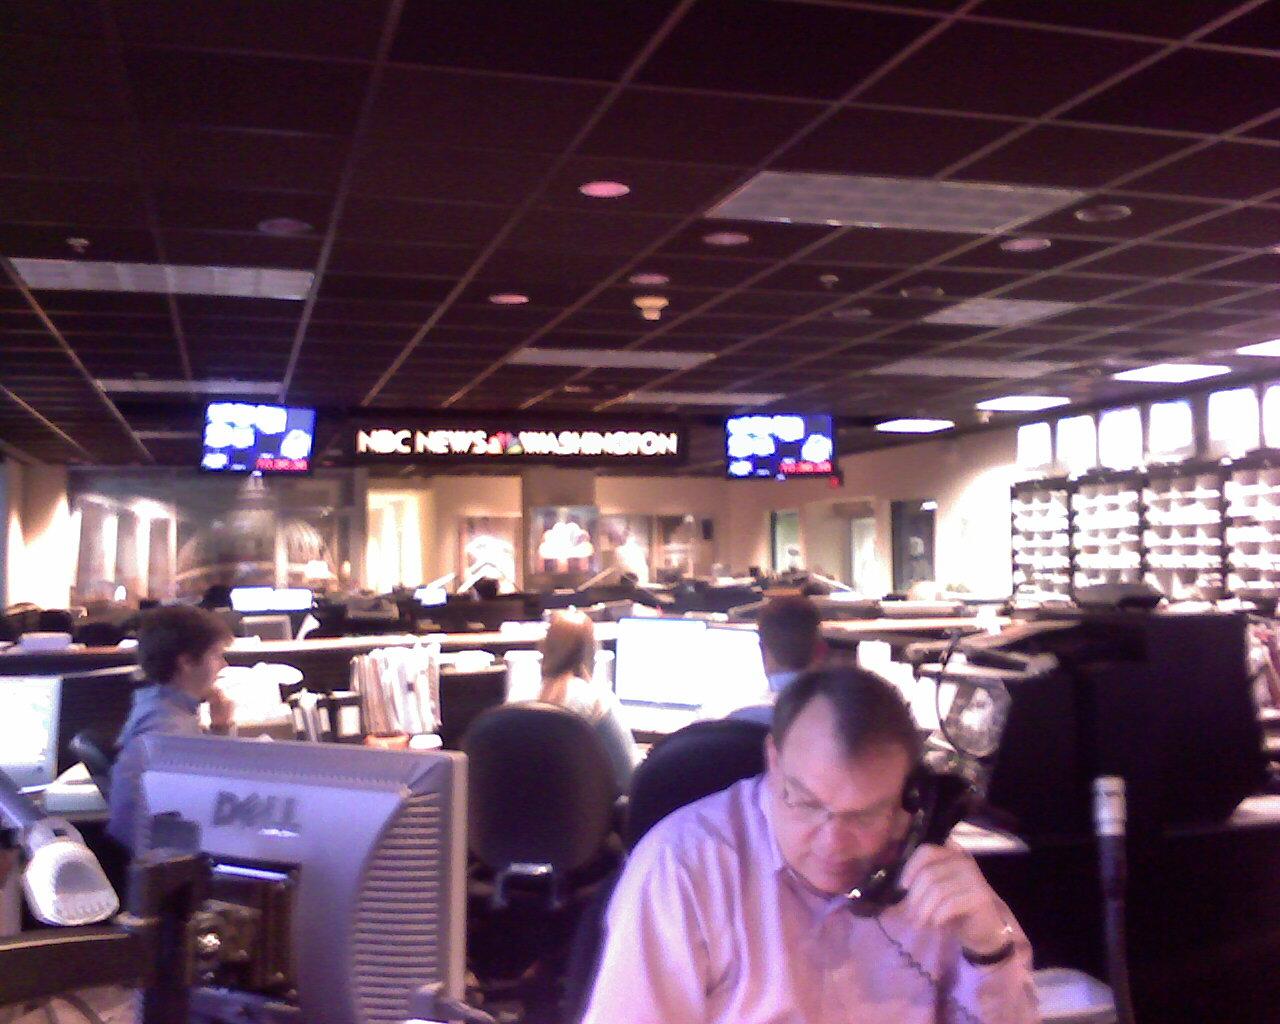 NBC News Washington Bureau